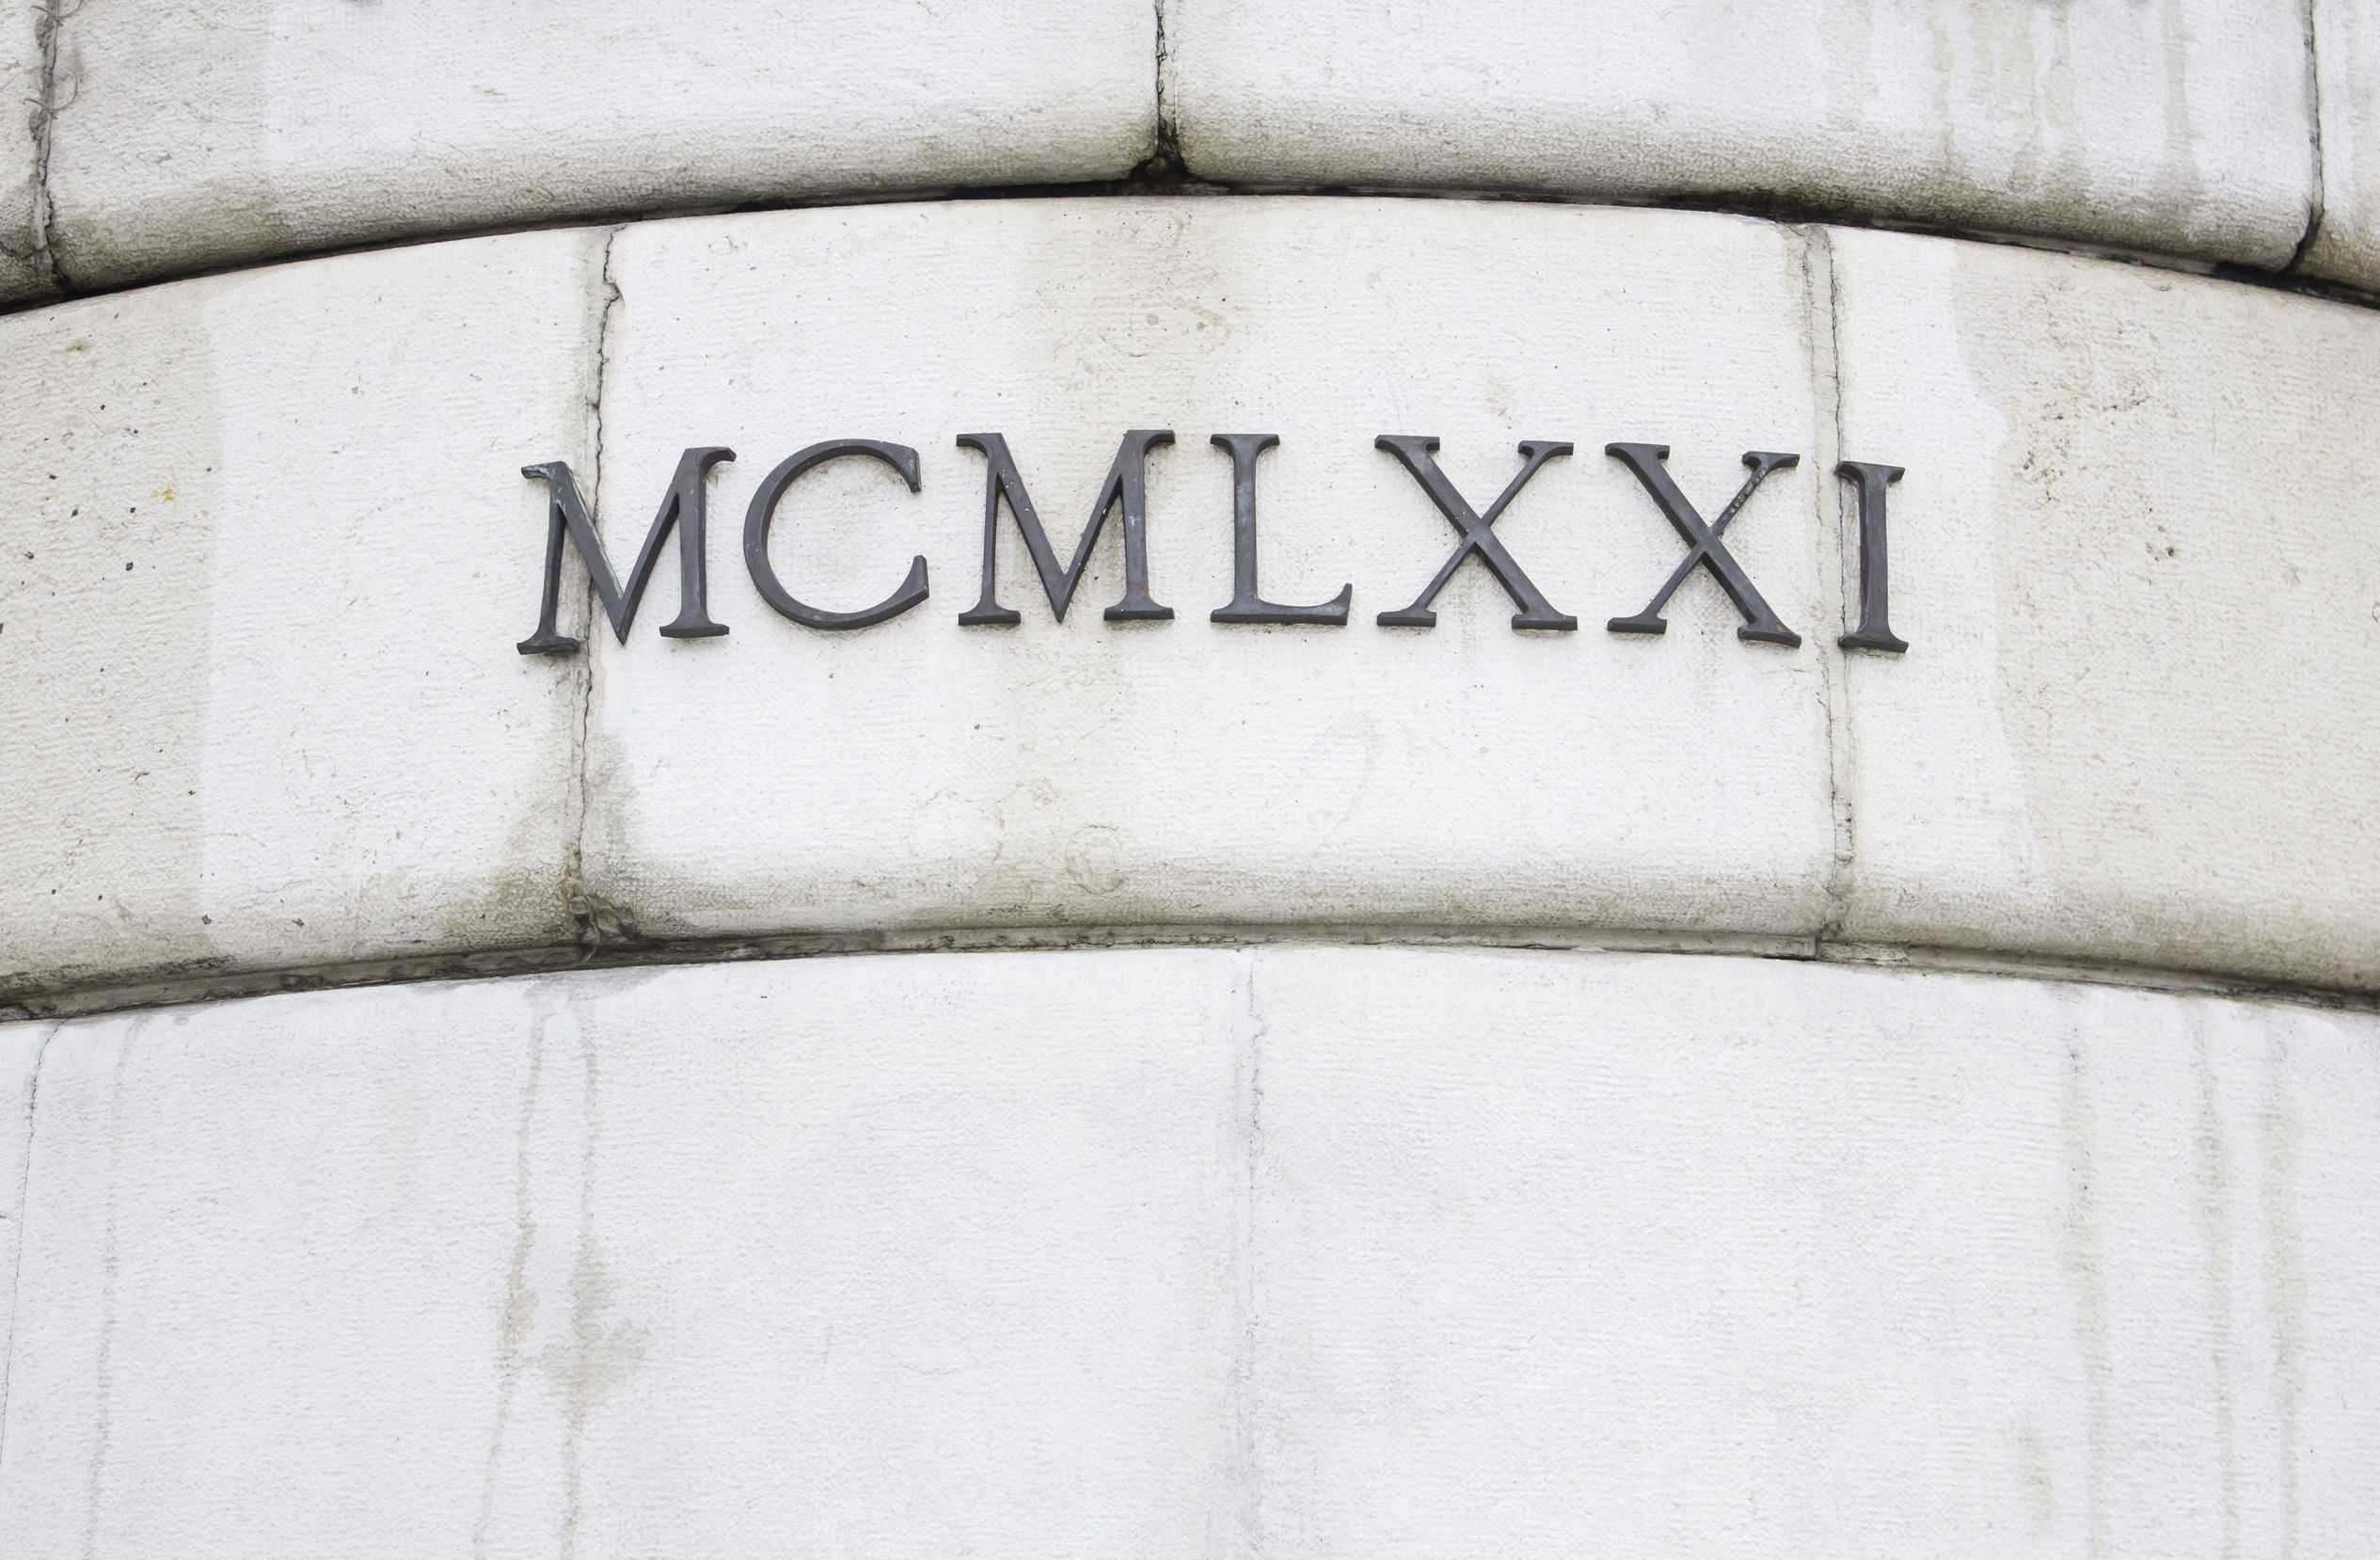 Números romanos en edificio